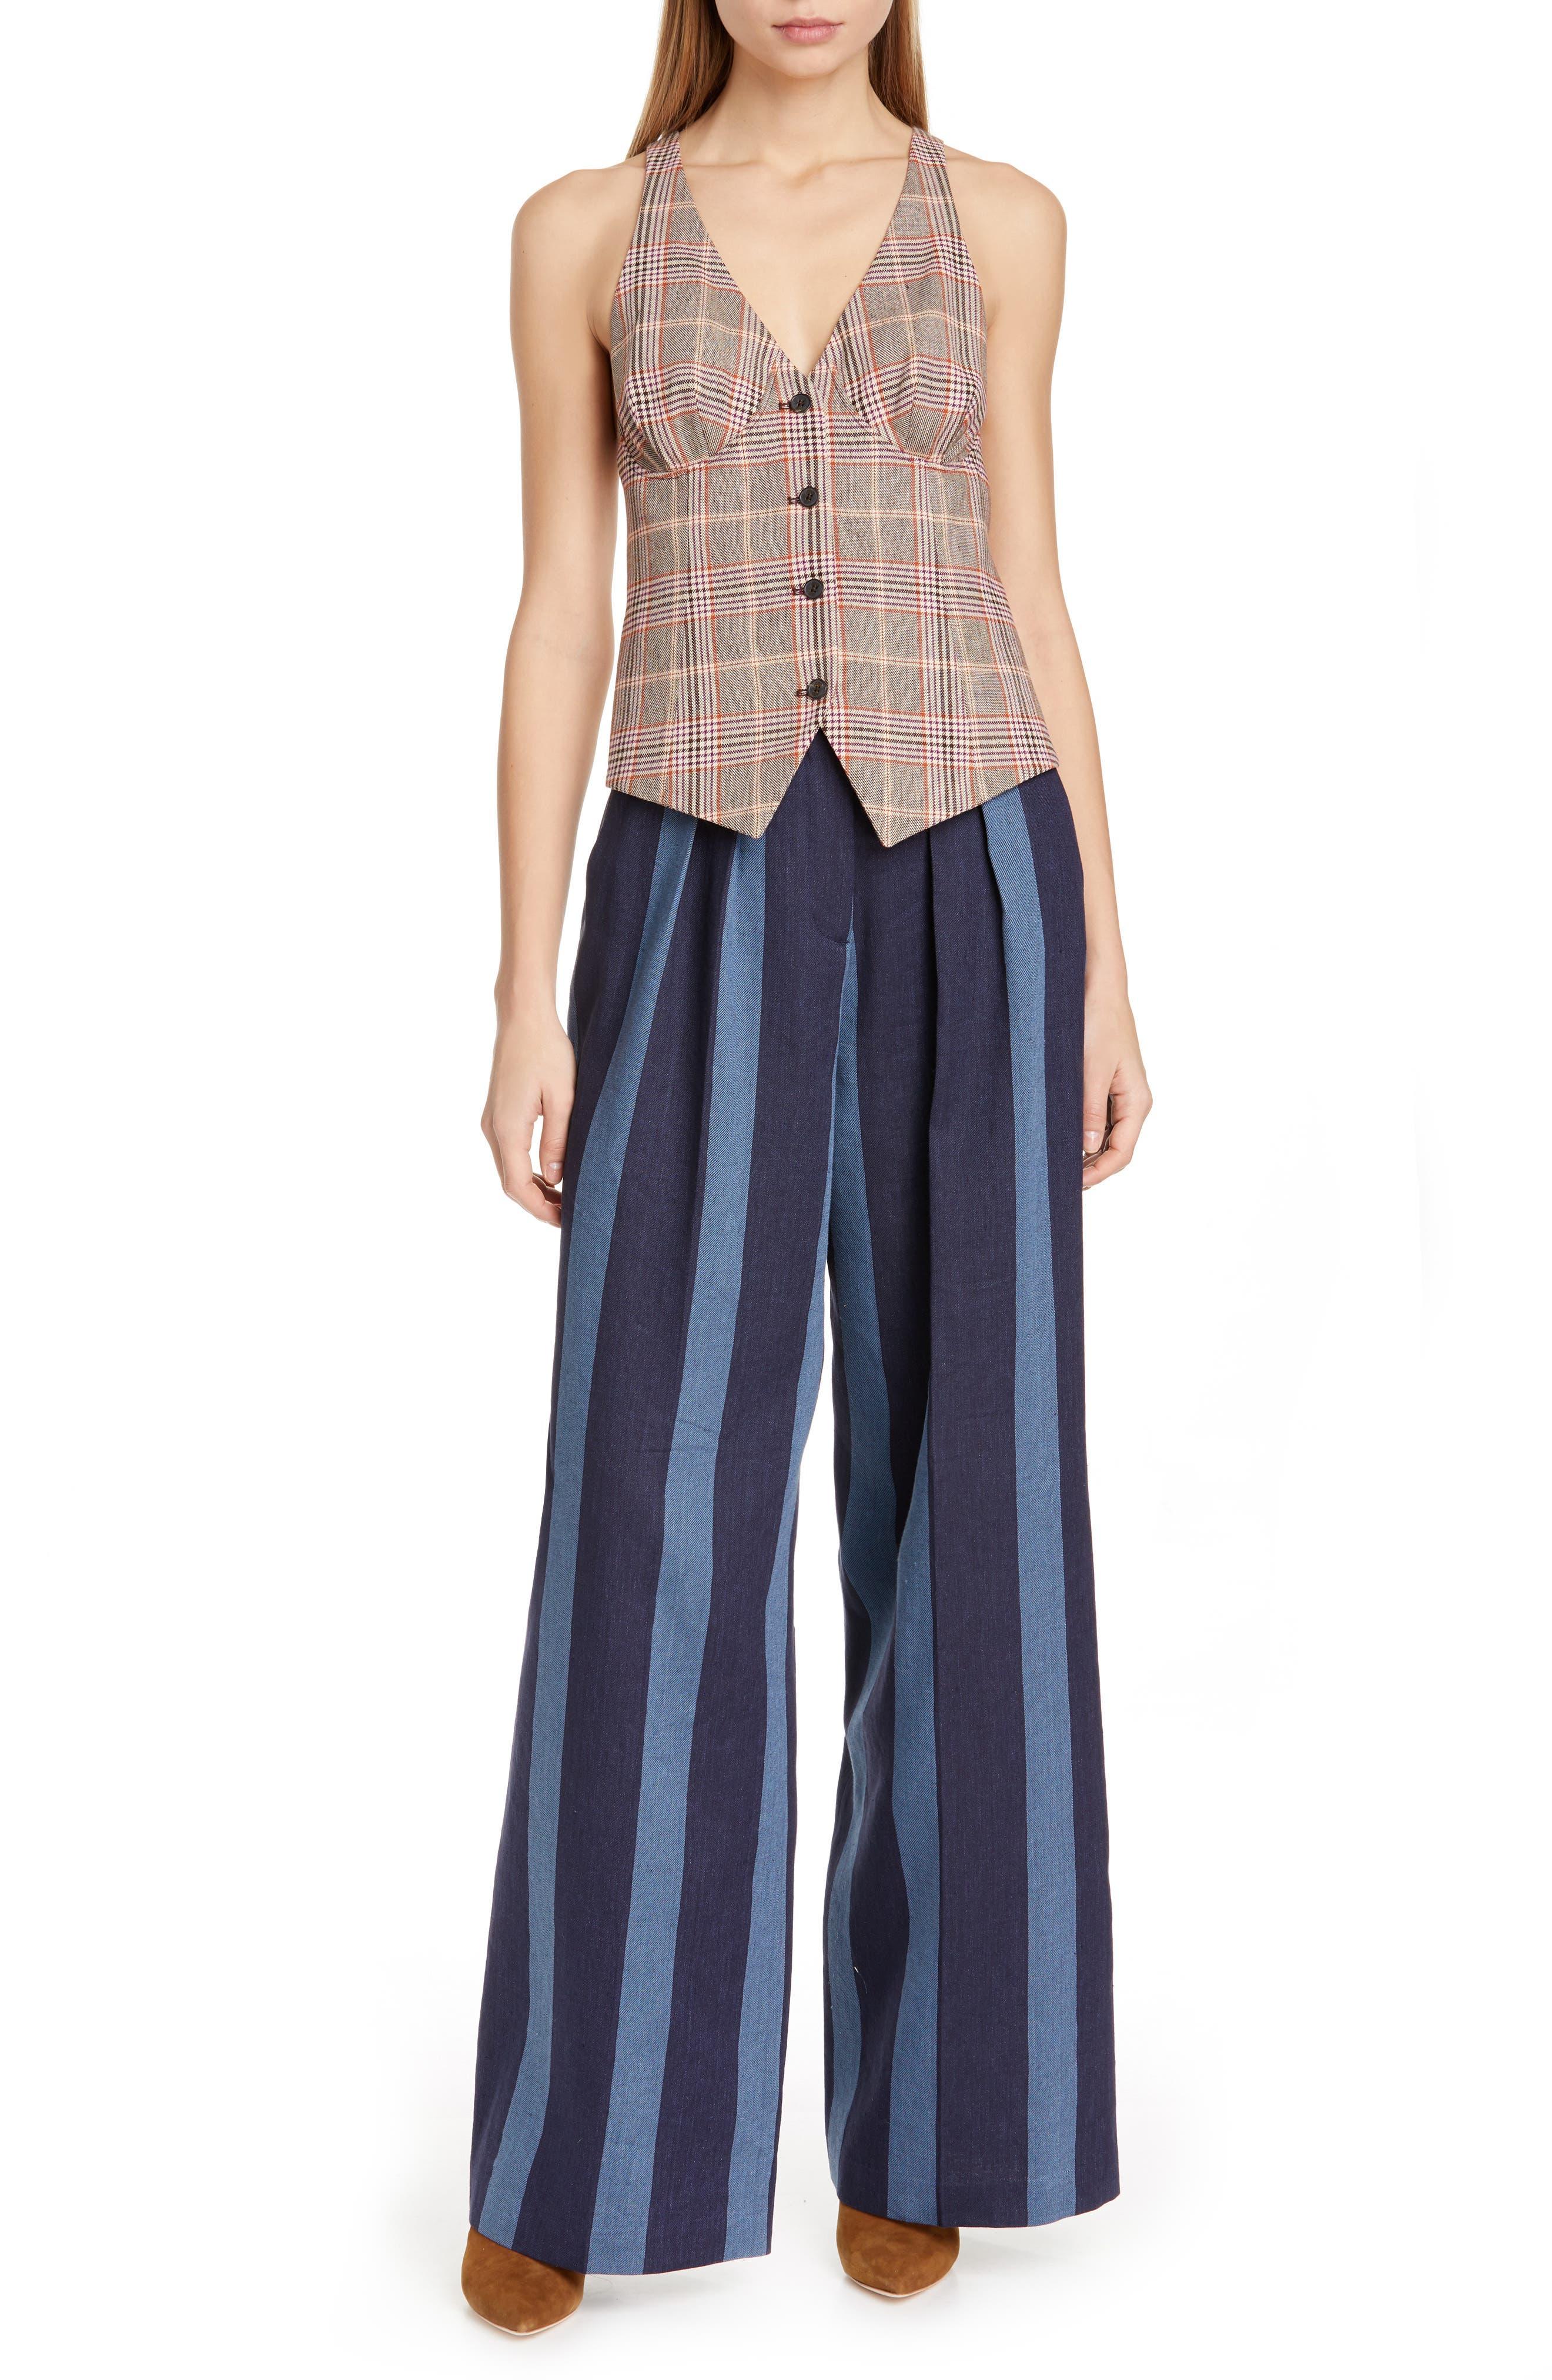 TOMMY X ZENDAYA, Stripe Denim Pants, Alternate thumbnail 8, color, STRIPED DENIM